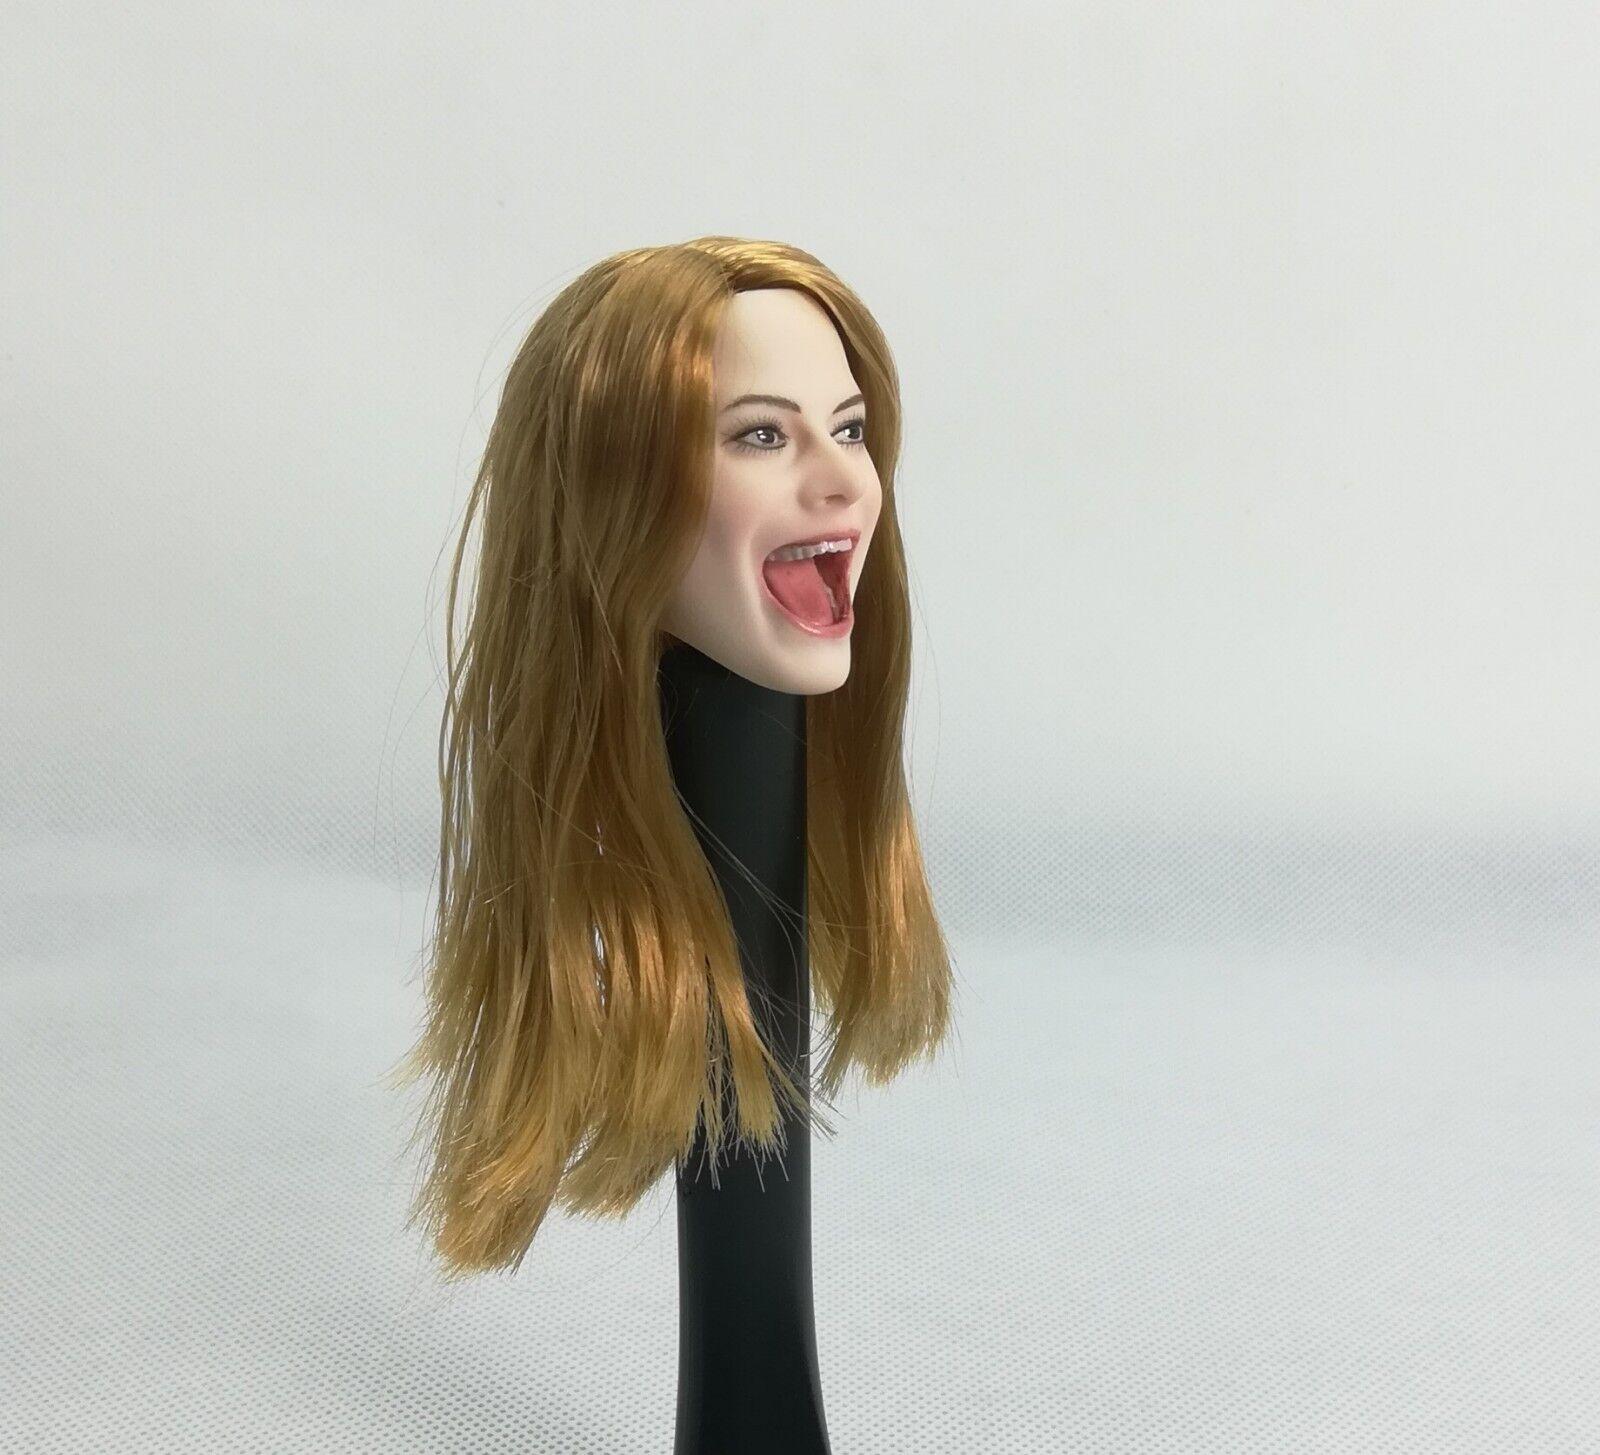 1 6 Female Blonde Hair Head Sculpt Singing Open Mouth F 12'' Figure Body